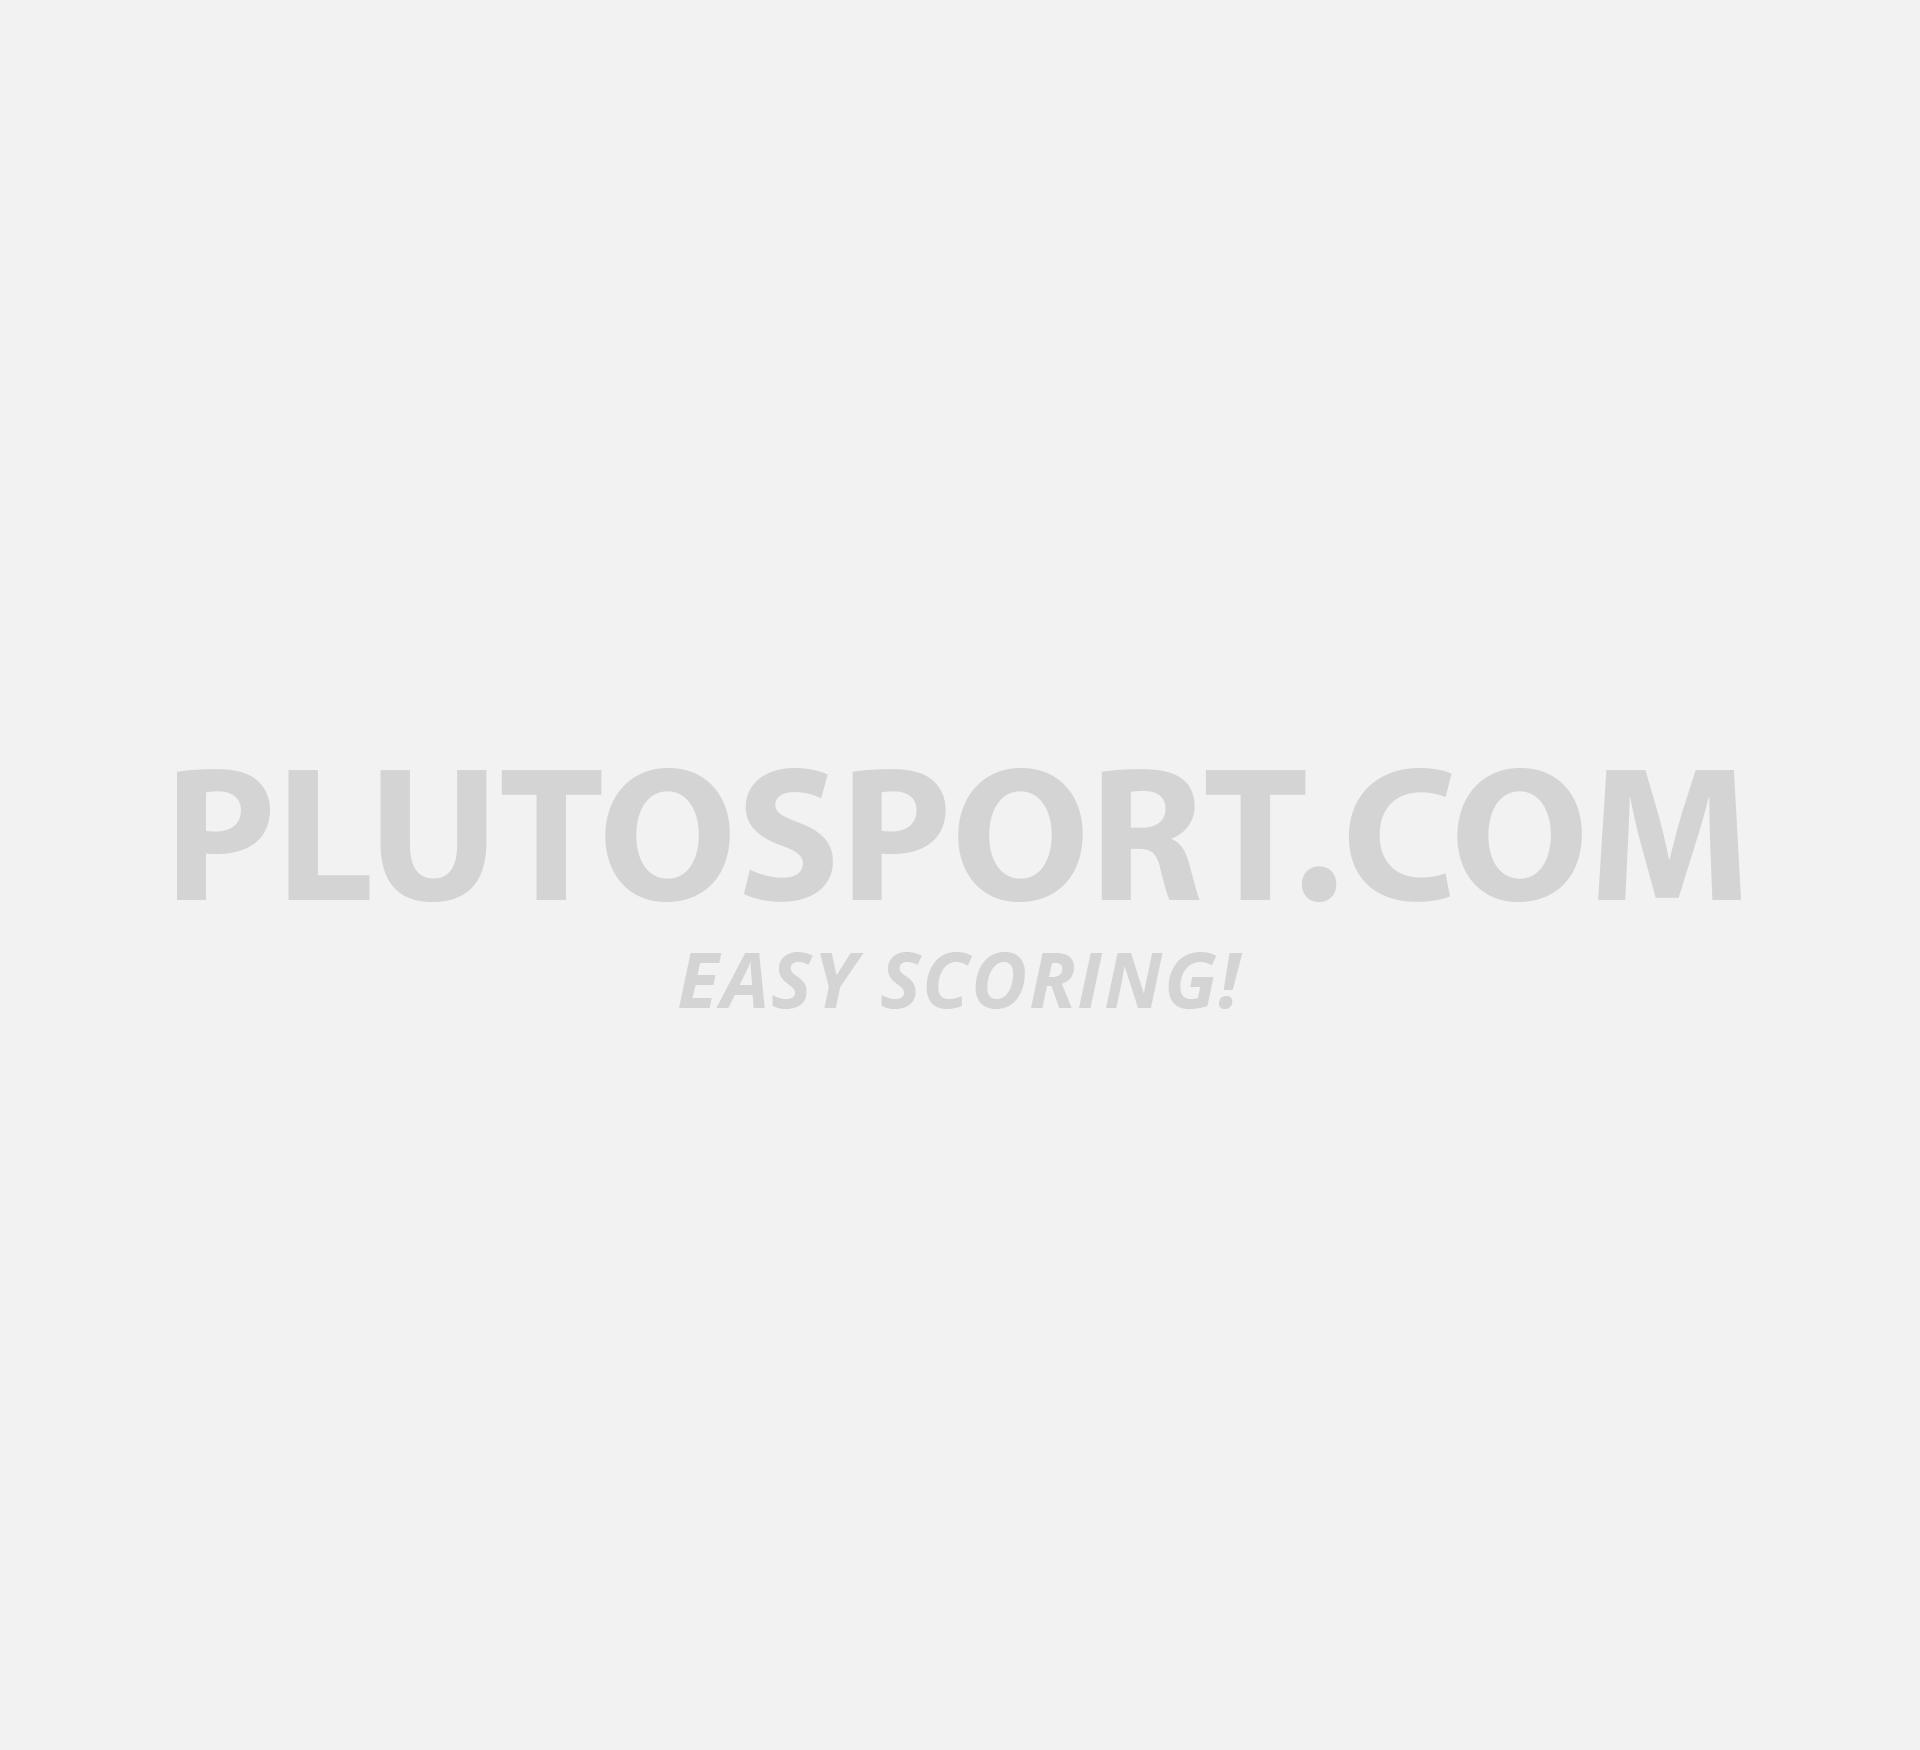 04884462 Brooks Mesh Run Hat - Caps - Accessories - Running - Sports | Plutosport